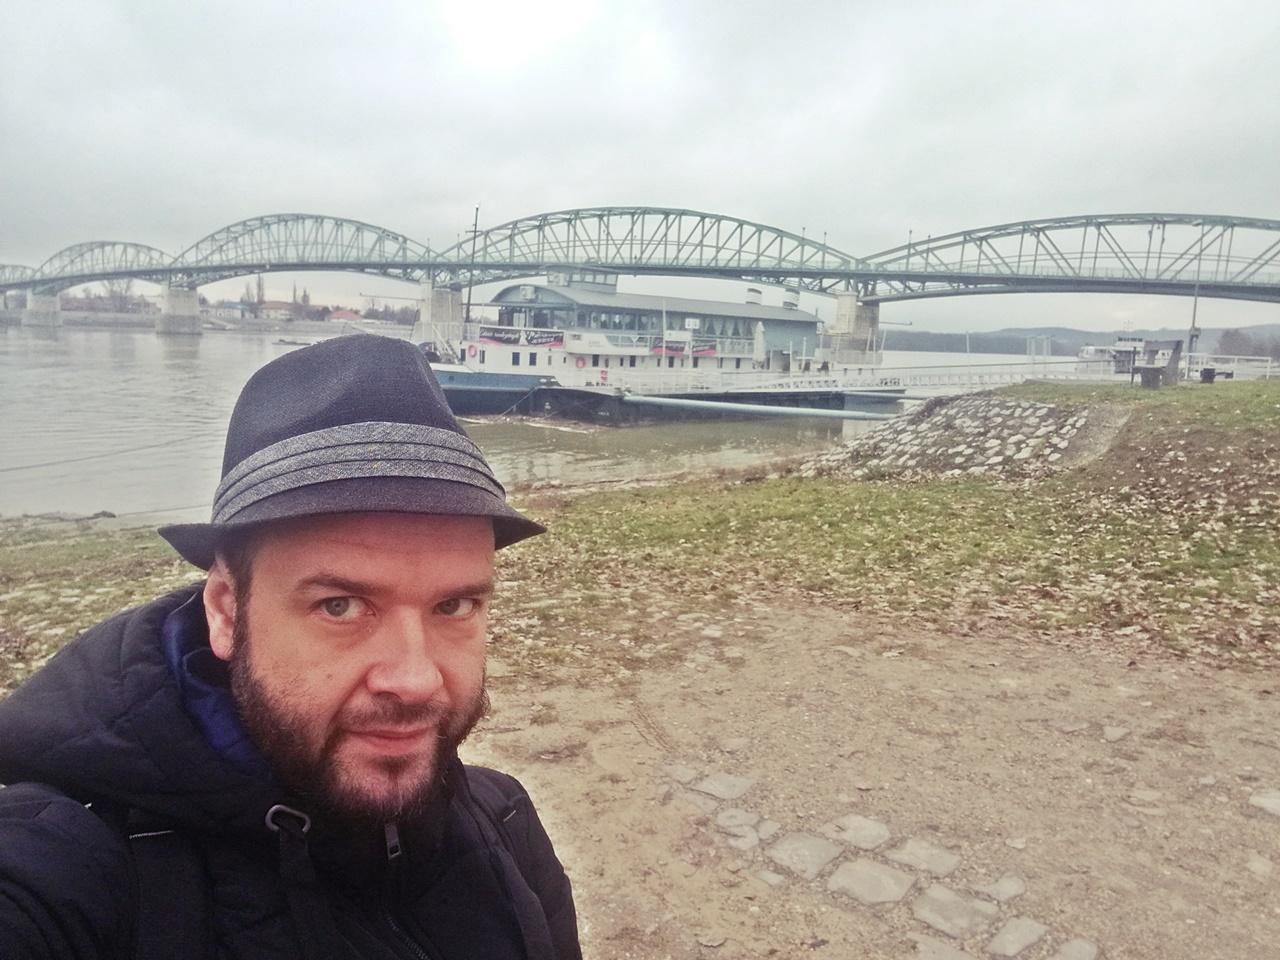 Esztergom - Mária Valéria híd - Kocsmaturista